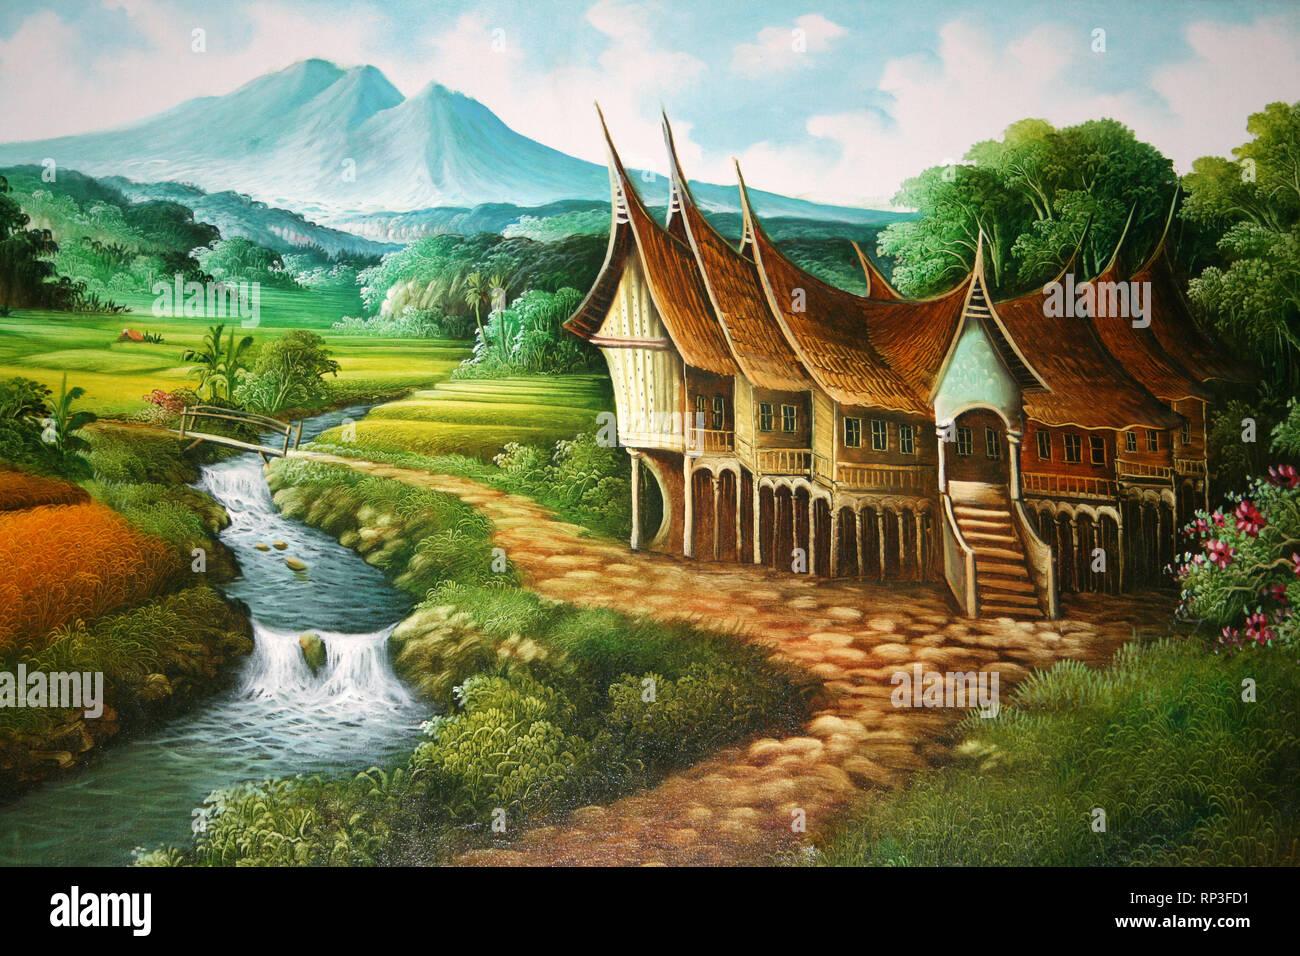 indonesia art showing rumah gadang house RP3FD1